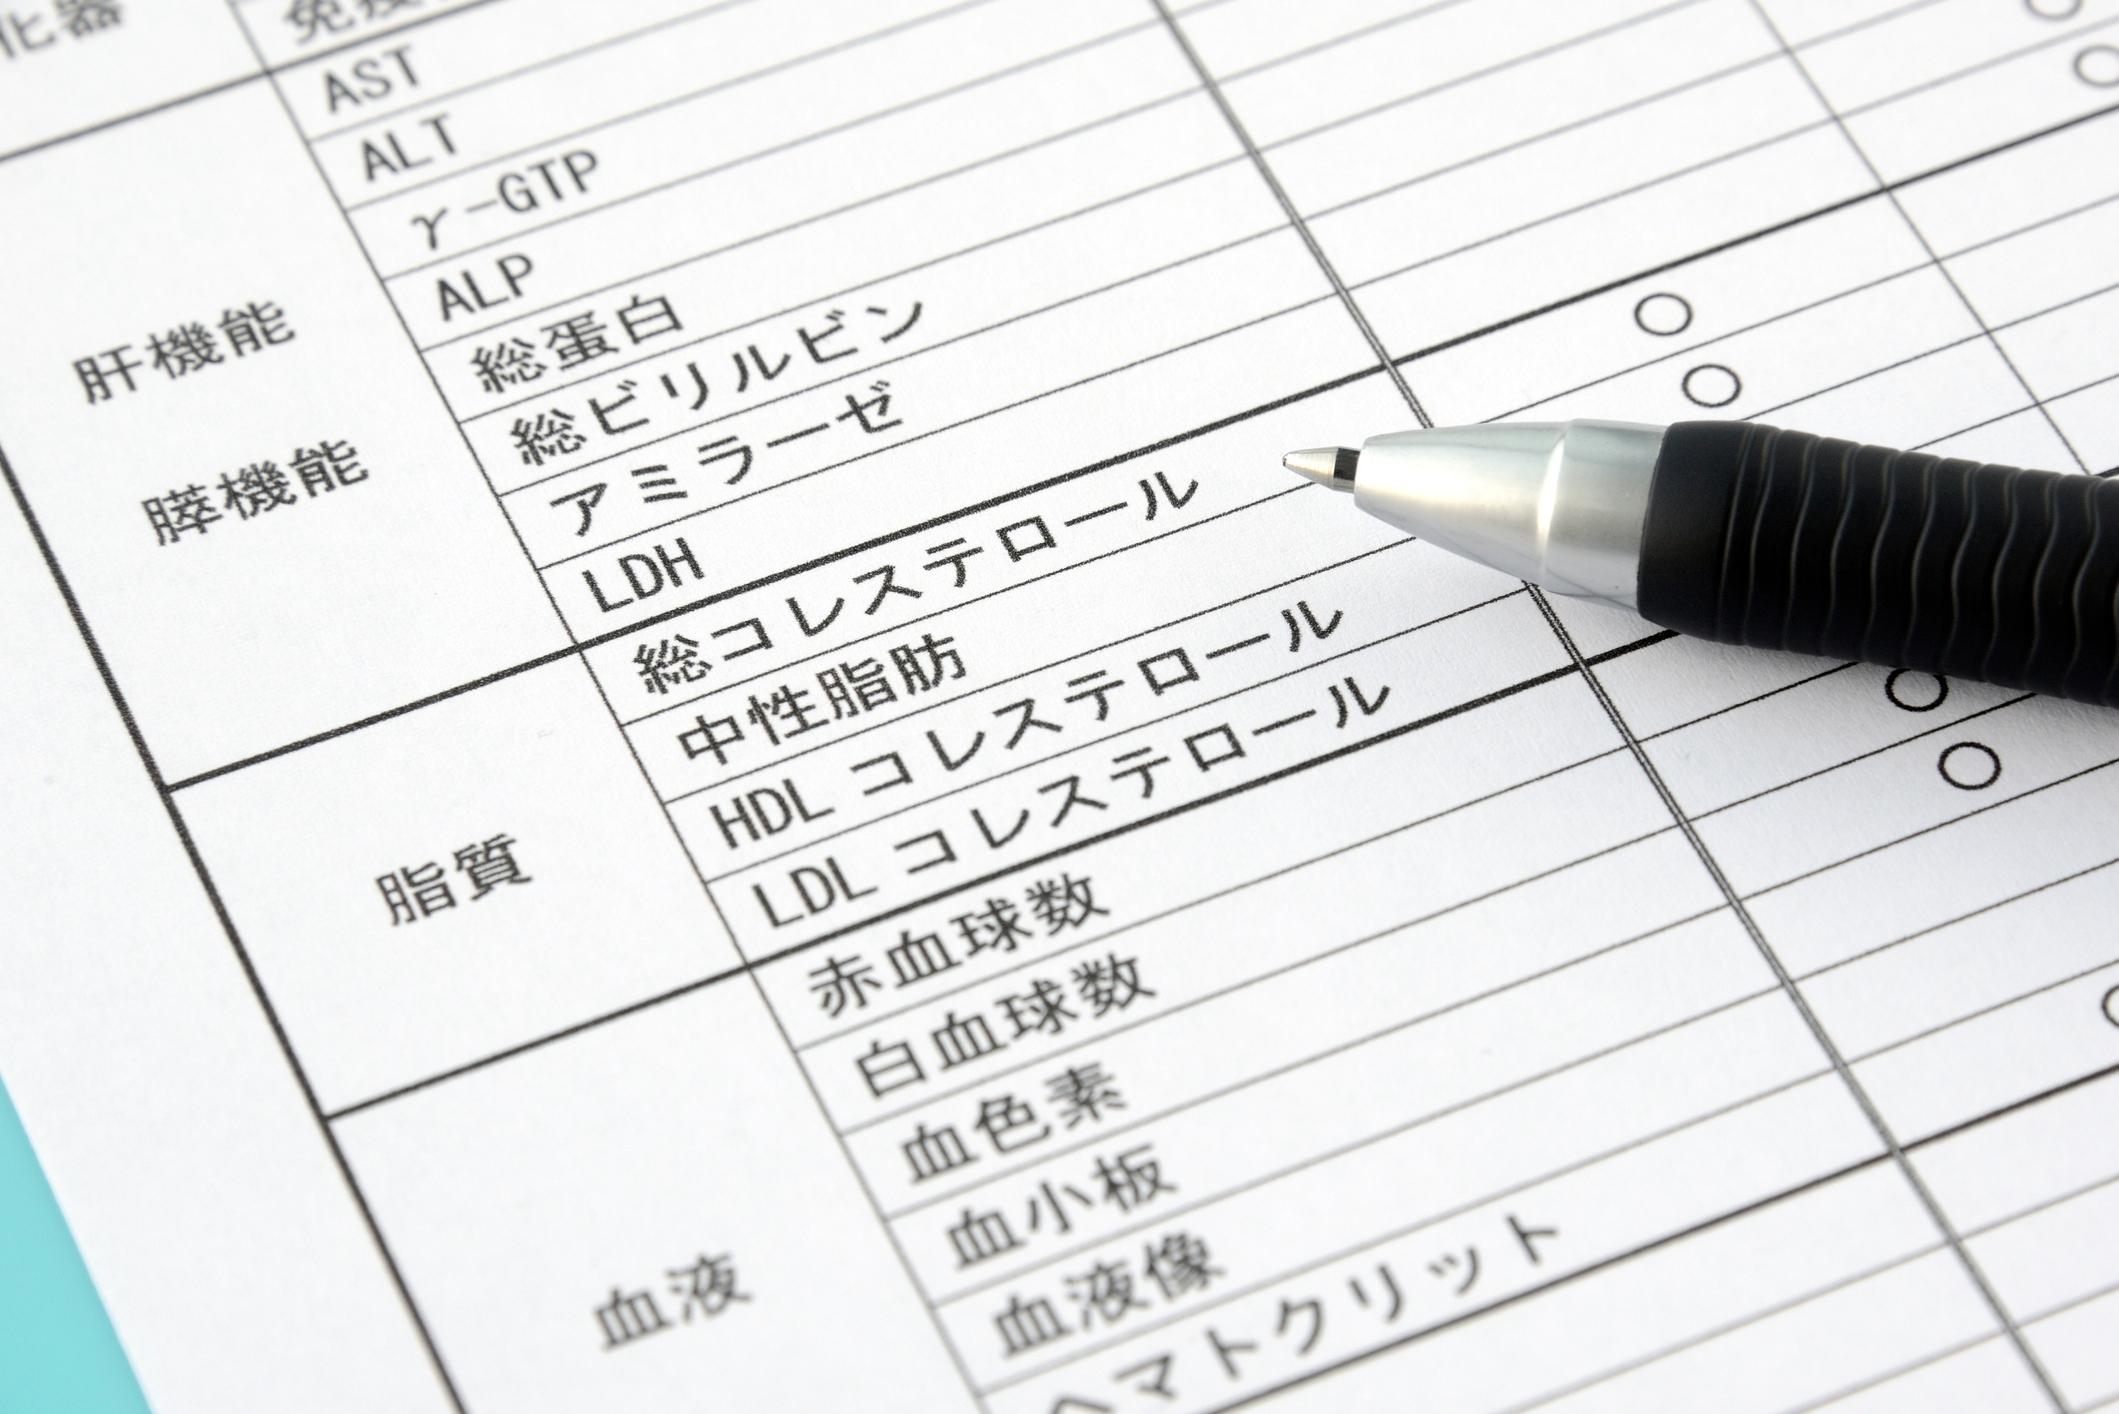 Medical examination sheet in Japanese